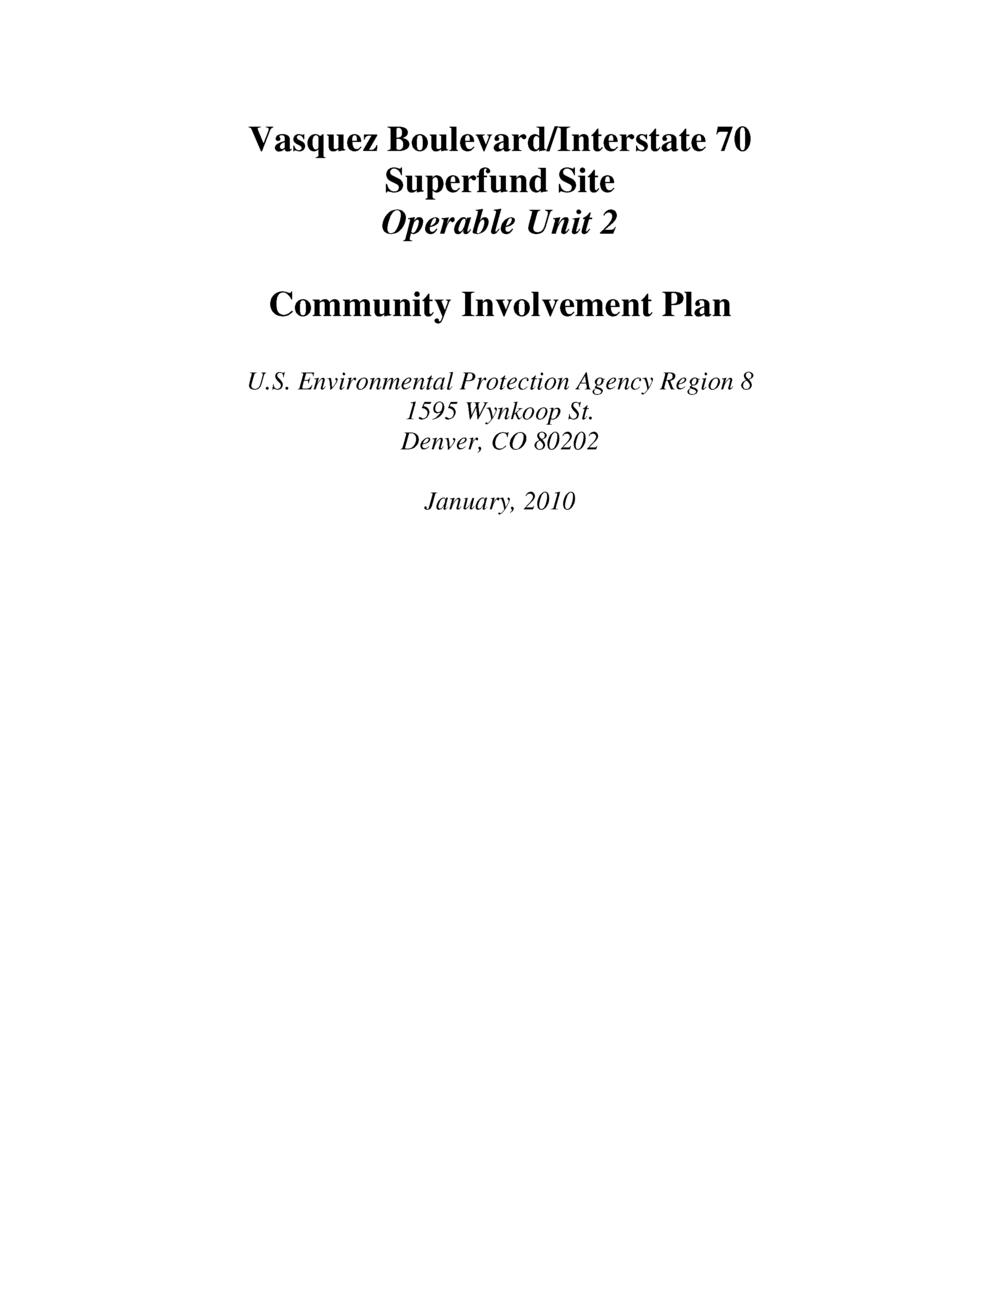 Superfund Community Involvement